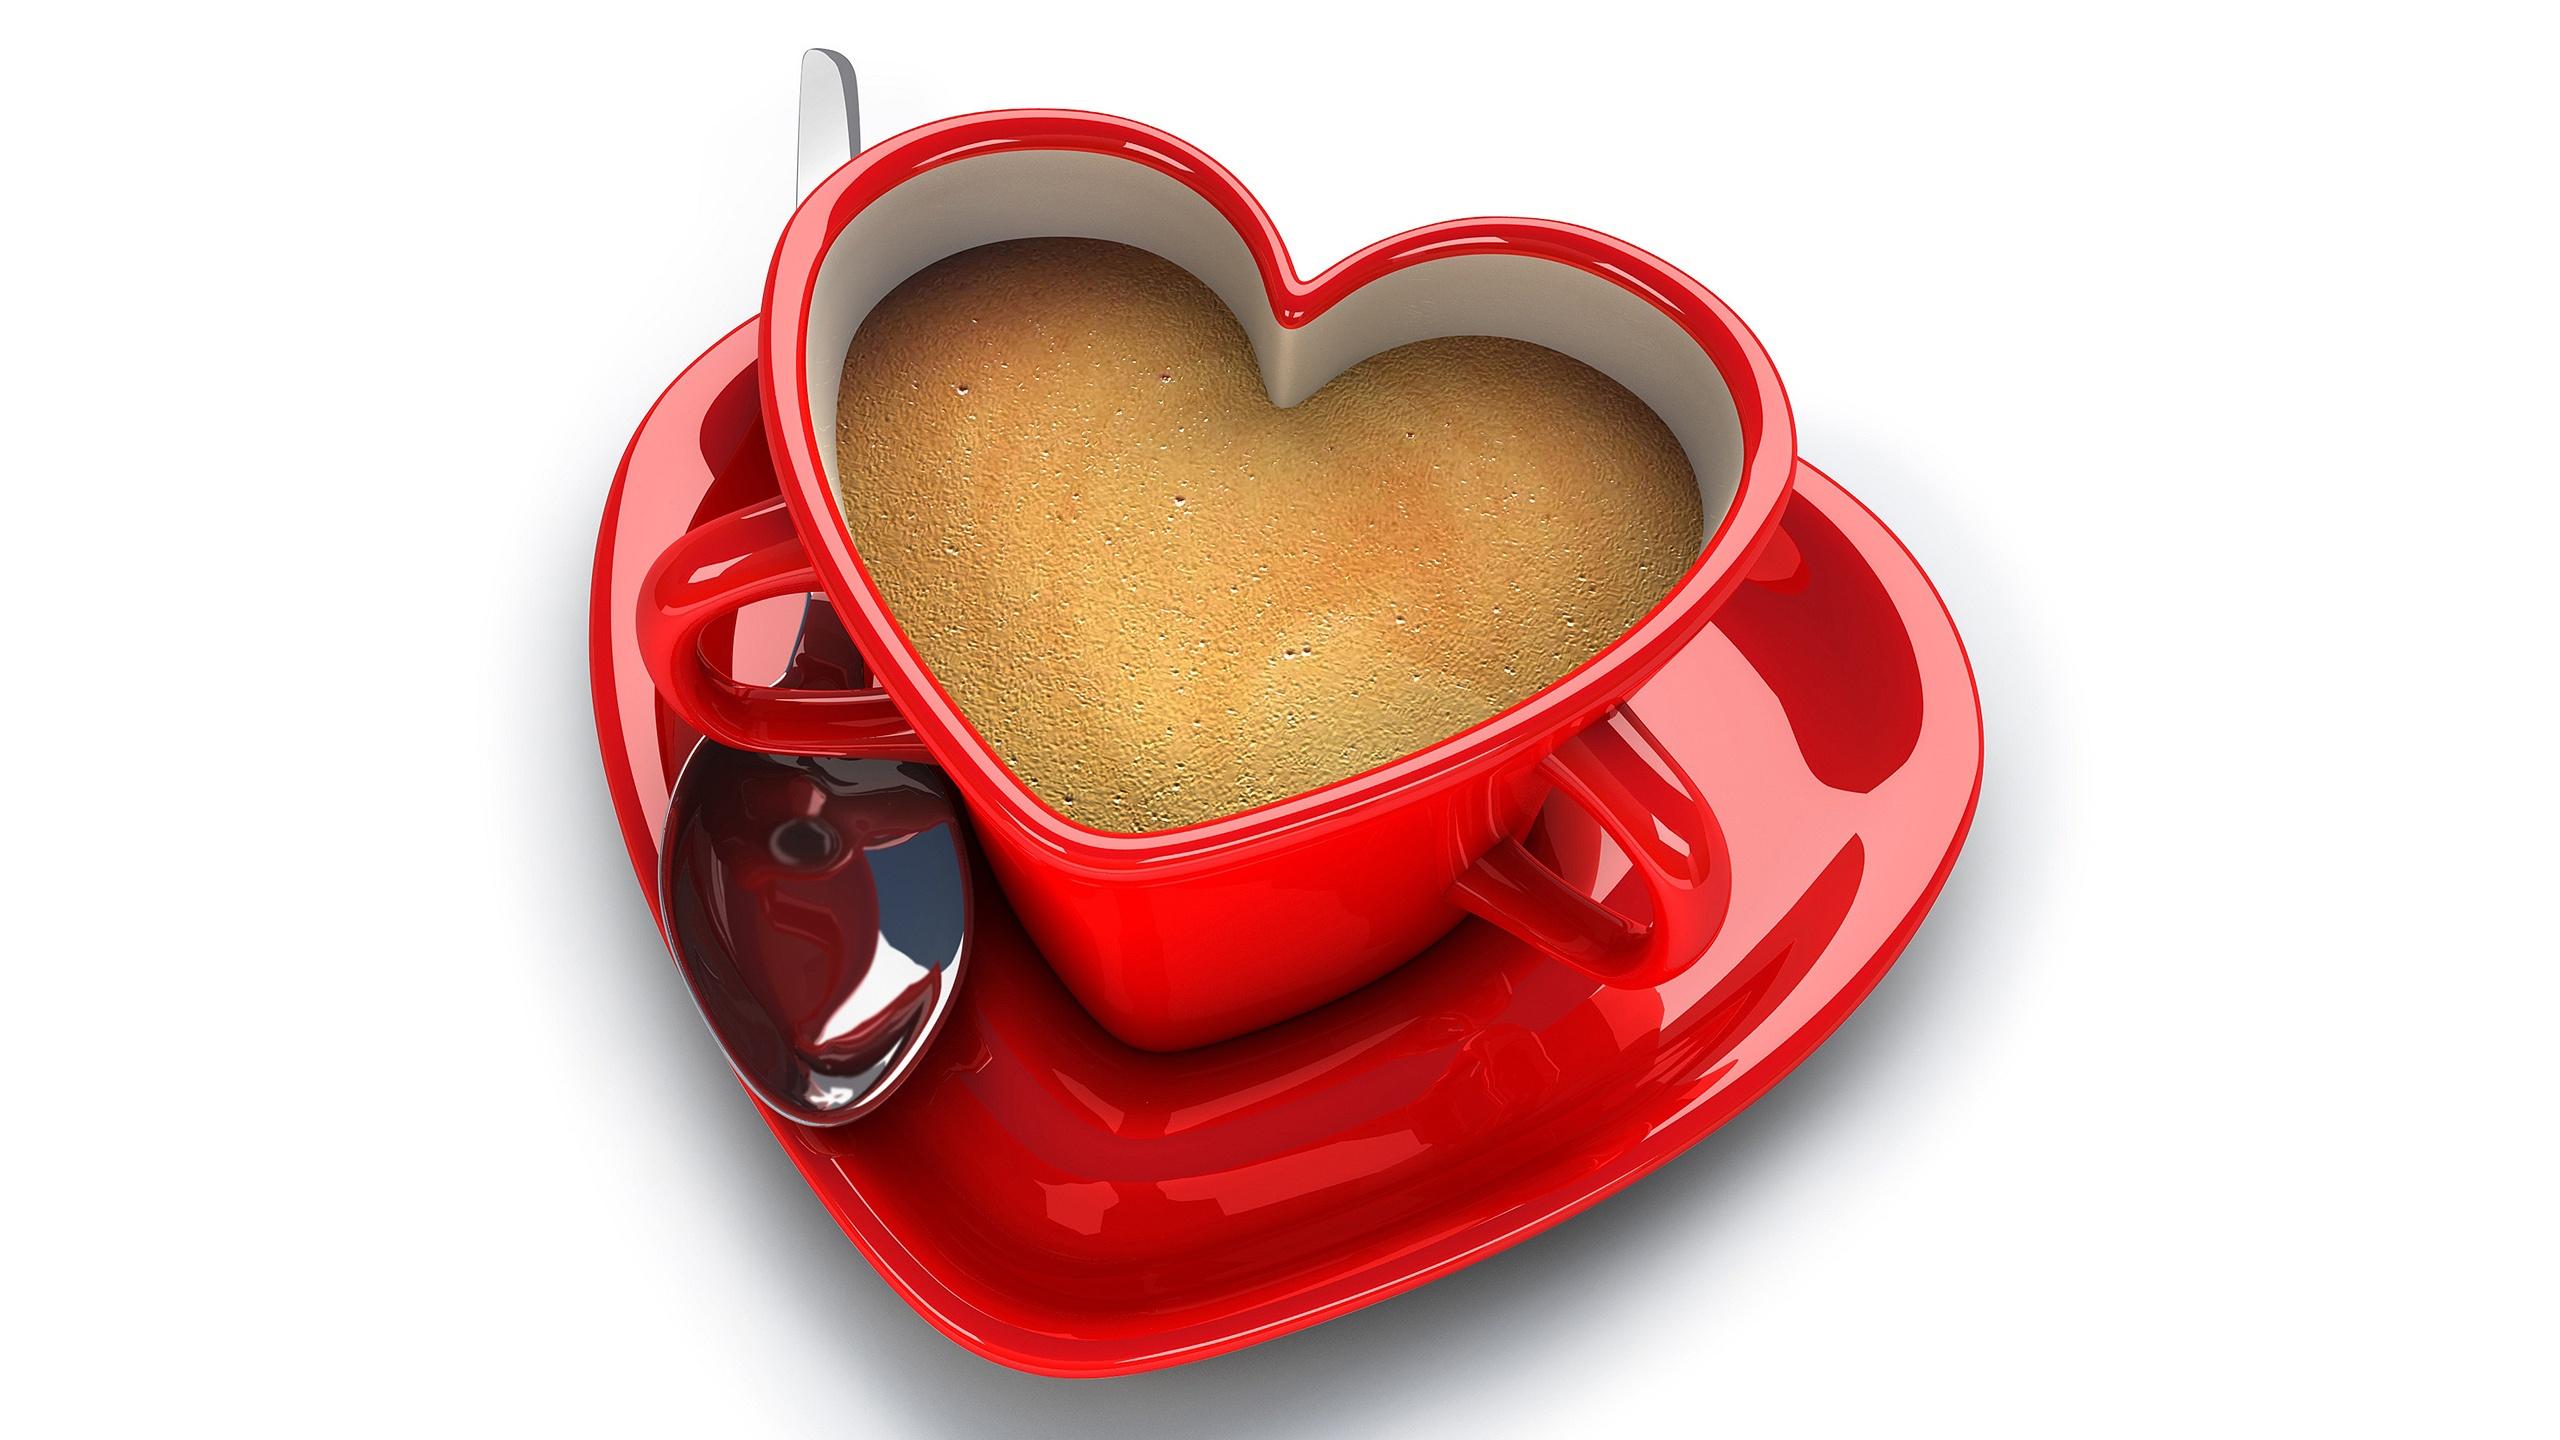 heart wallpapers coffee